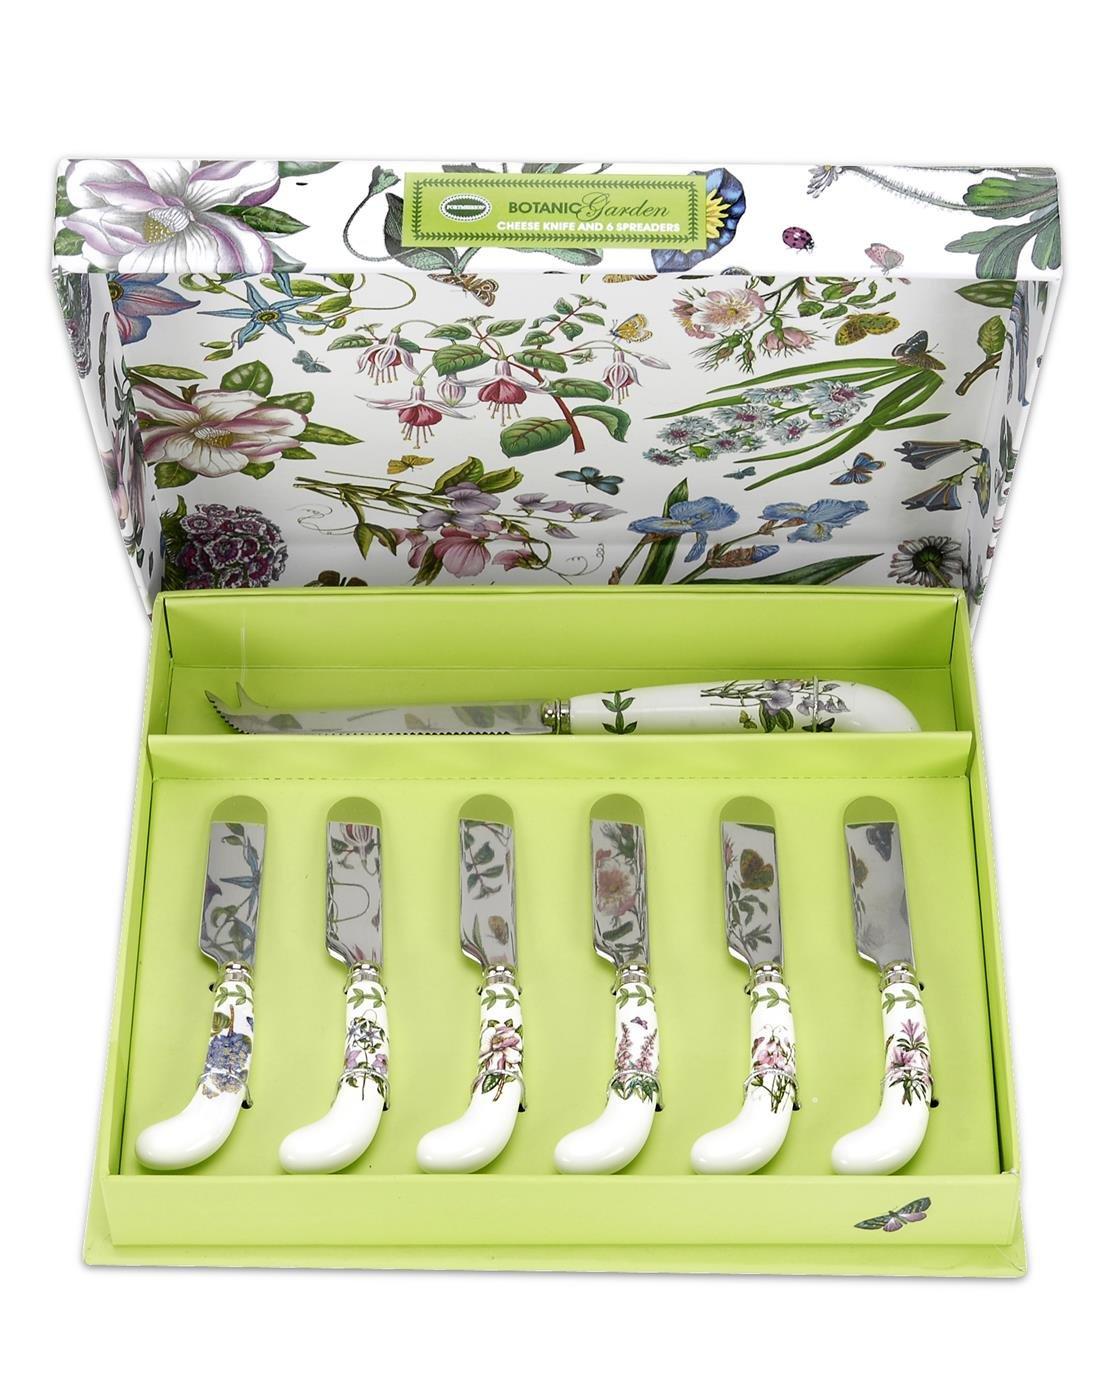 Portmeirion Botanic Garden Cheese Knife and 6 Spreader's by Portmeirion